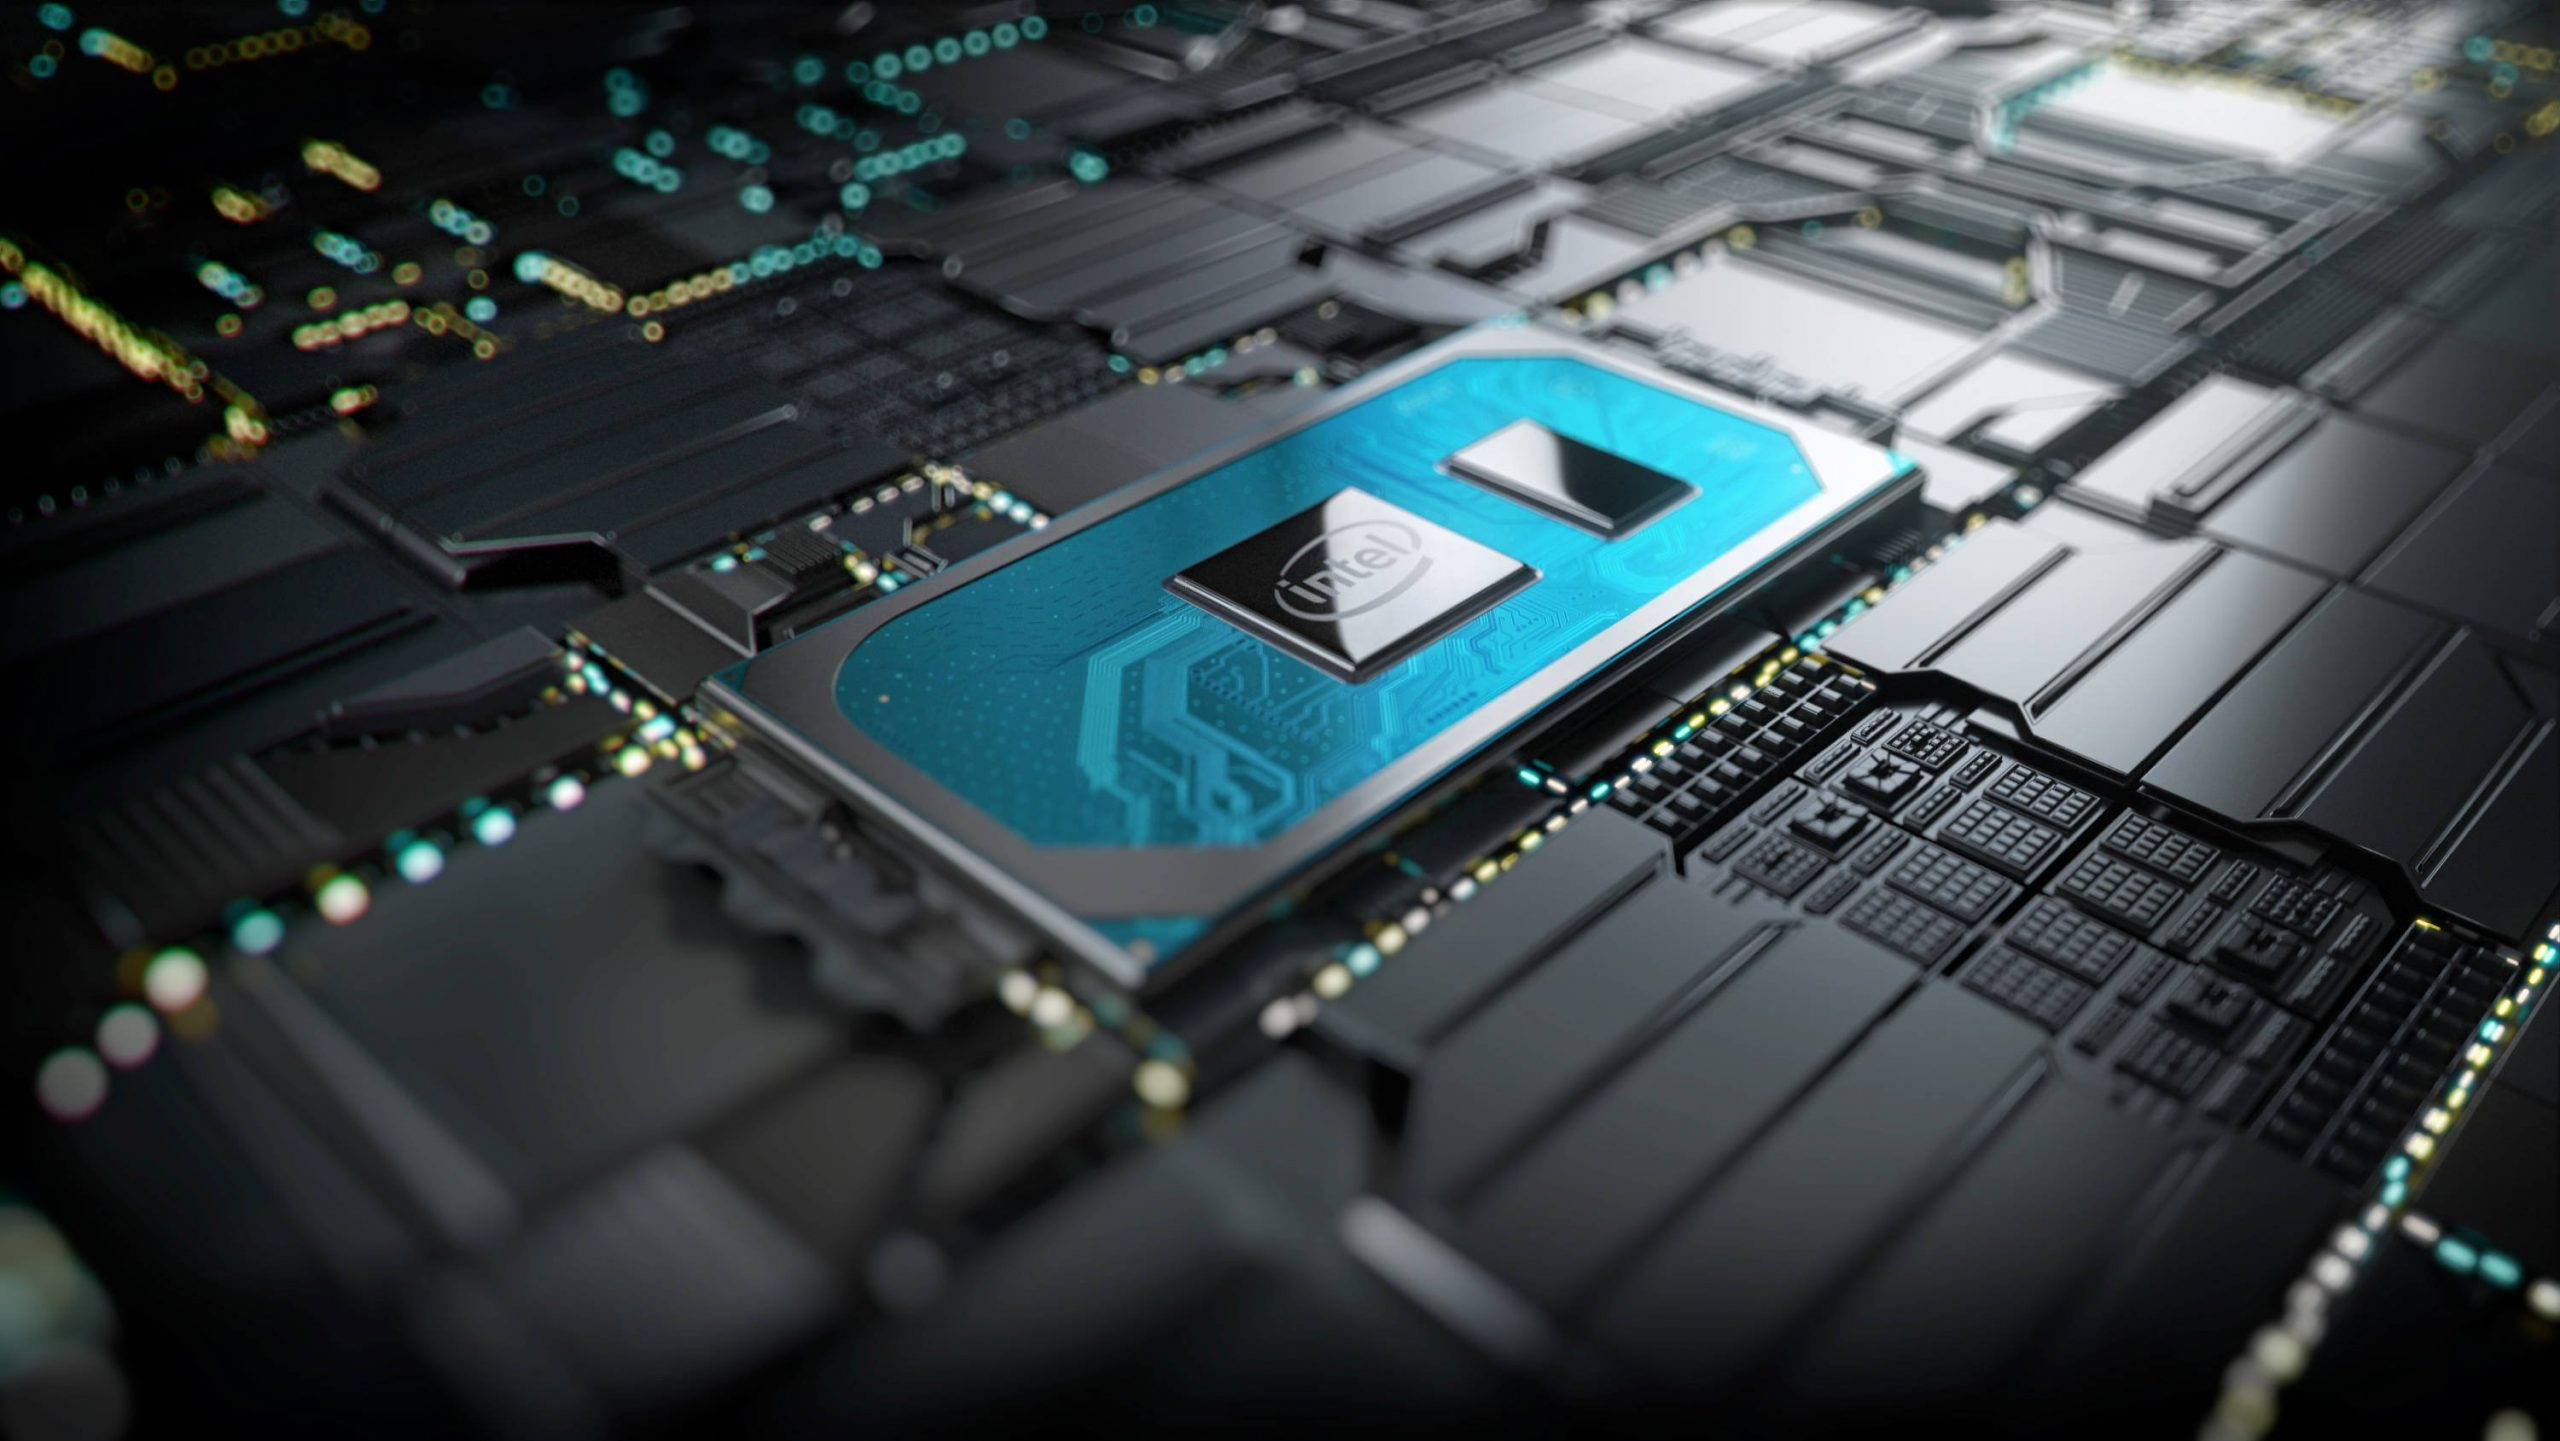 Internet marketing Intel's internal blueprints – 20GB of source code, specs, docs – stolen by hacker, spill onto internet